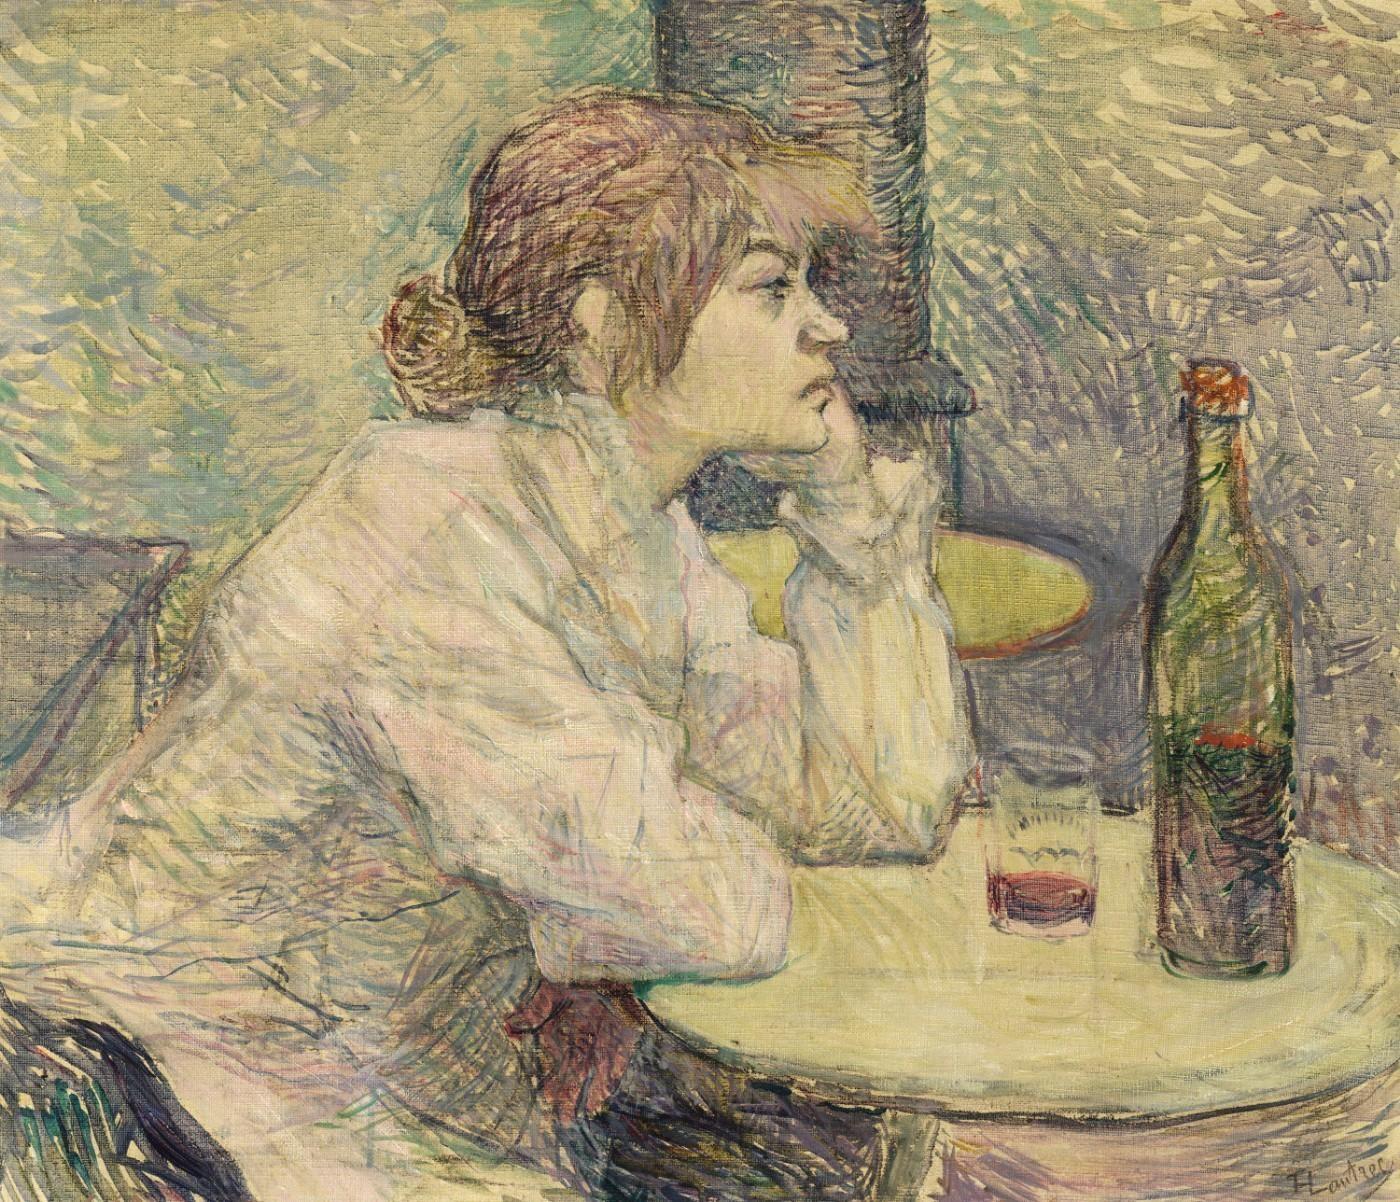 Rarely Seen Works By Henri De Toulouse Lautrec Showcased At Mfa Boston Henri De Toulouse Lautrec Toulouse Lautrec Paintings Henri De Toulouse Lautrec Paintings